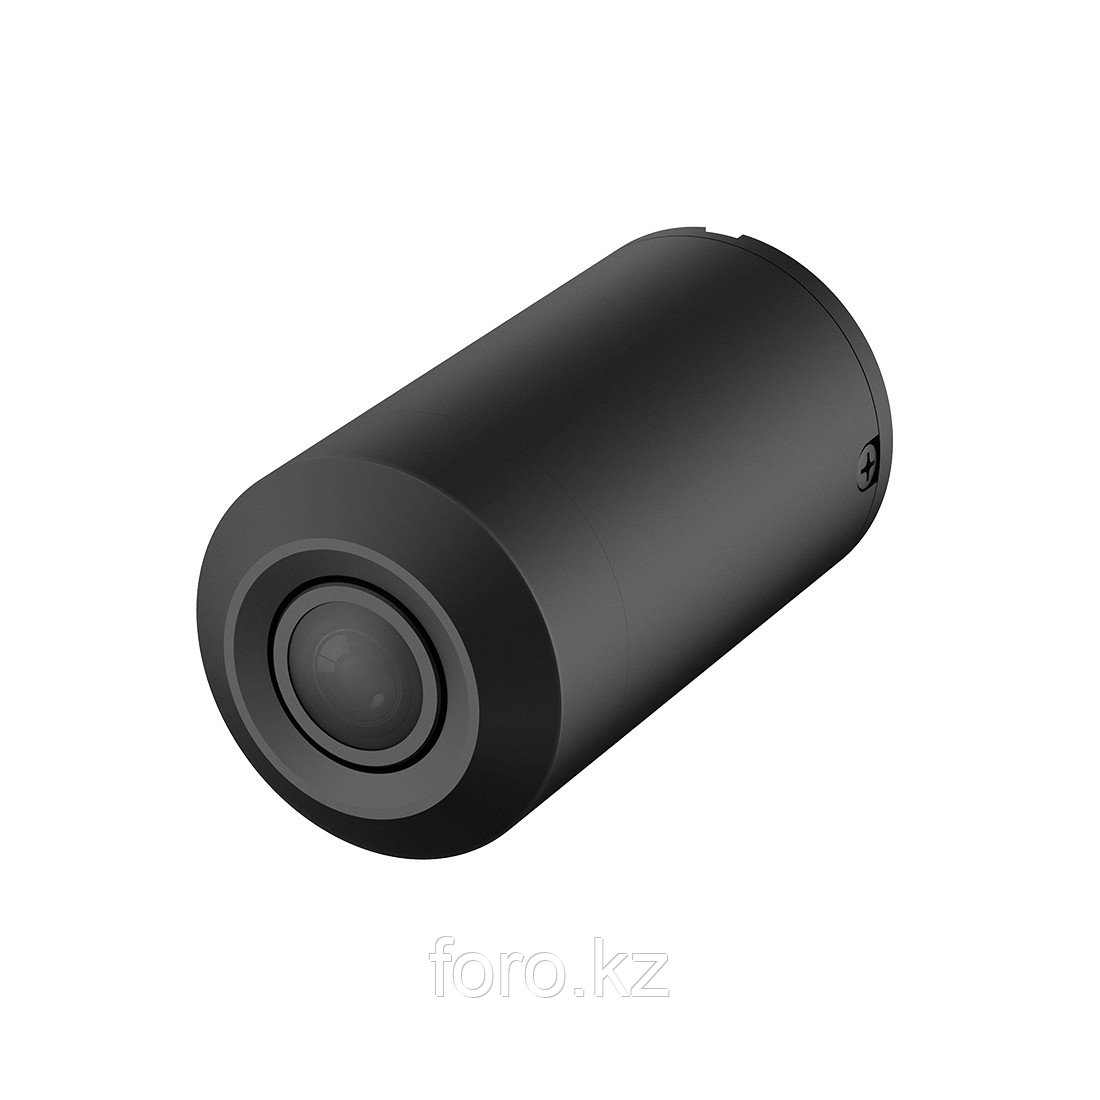 Видеокамера Dahua IPC-HUM8231-L3